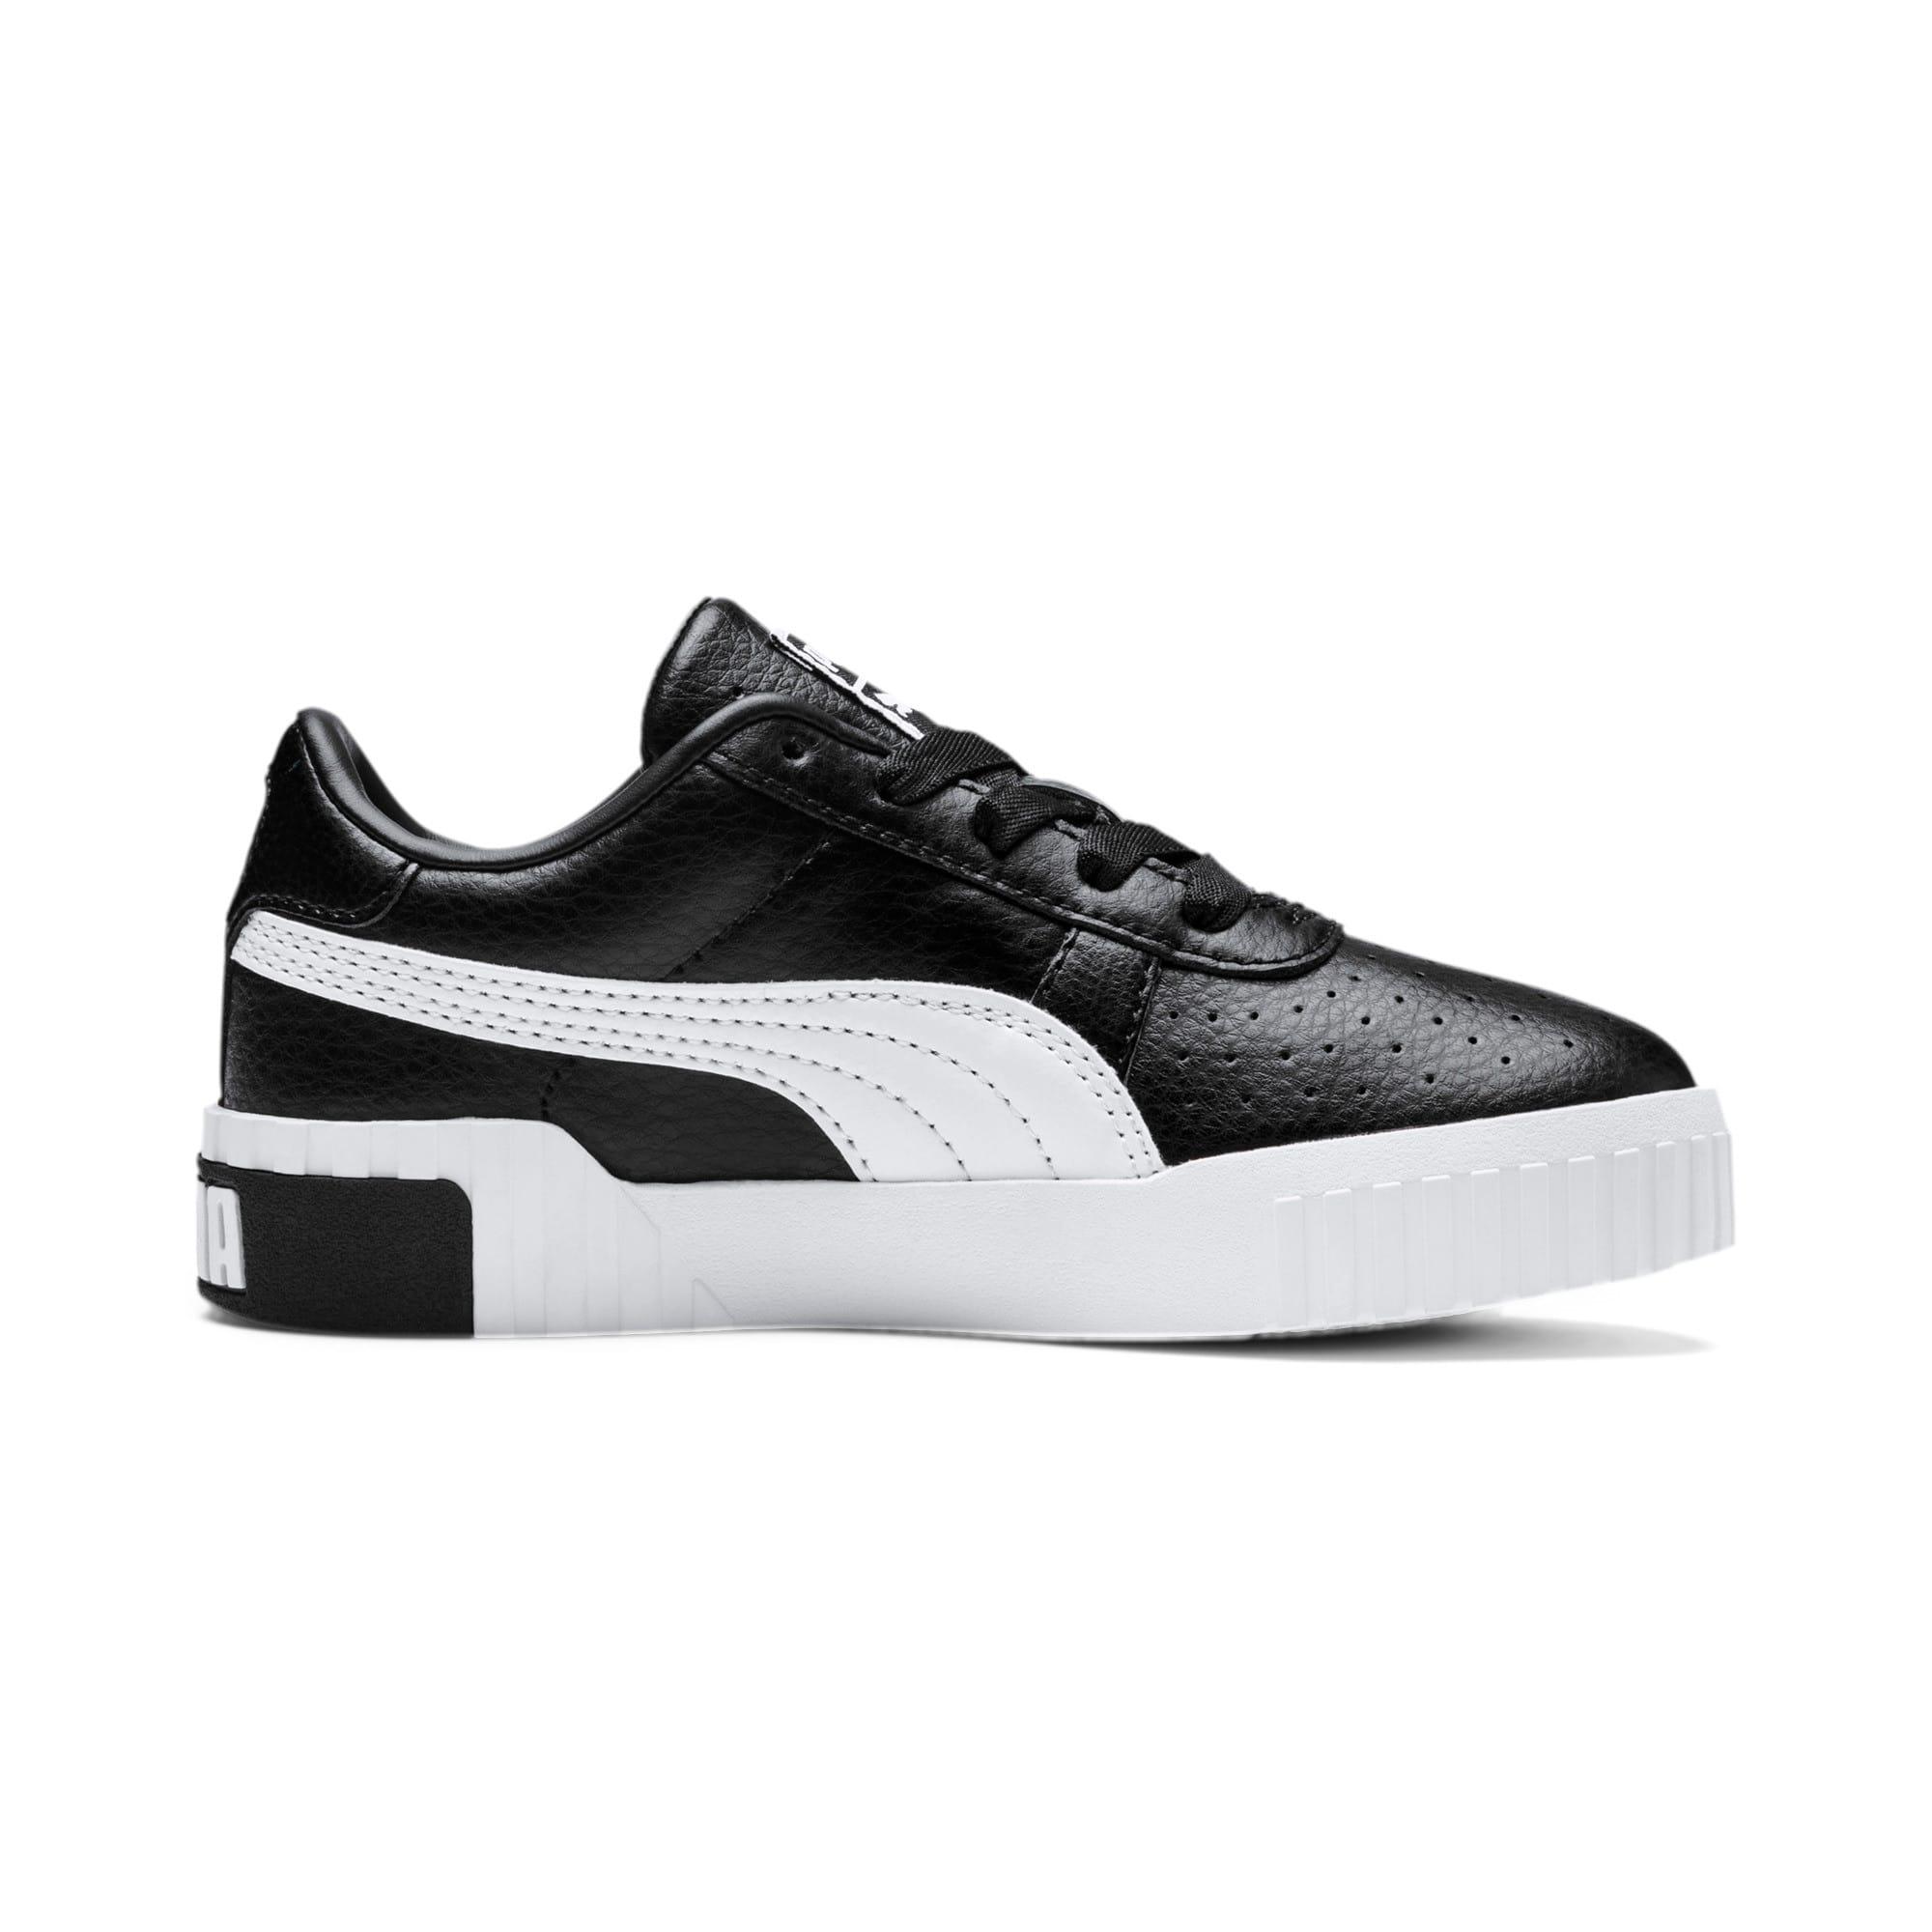 Thumbnail 5 of Cali Kids' Mädchen Sneaker, Puma Black-Puma Team Gold, medium